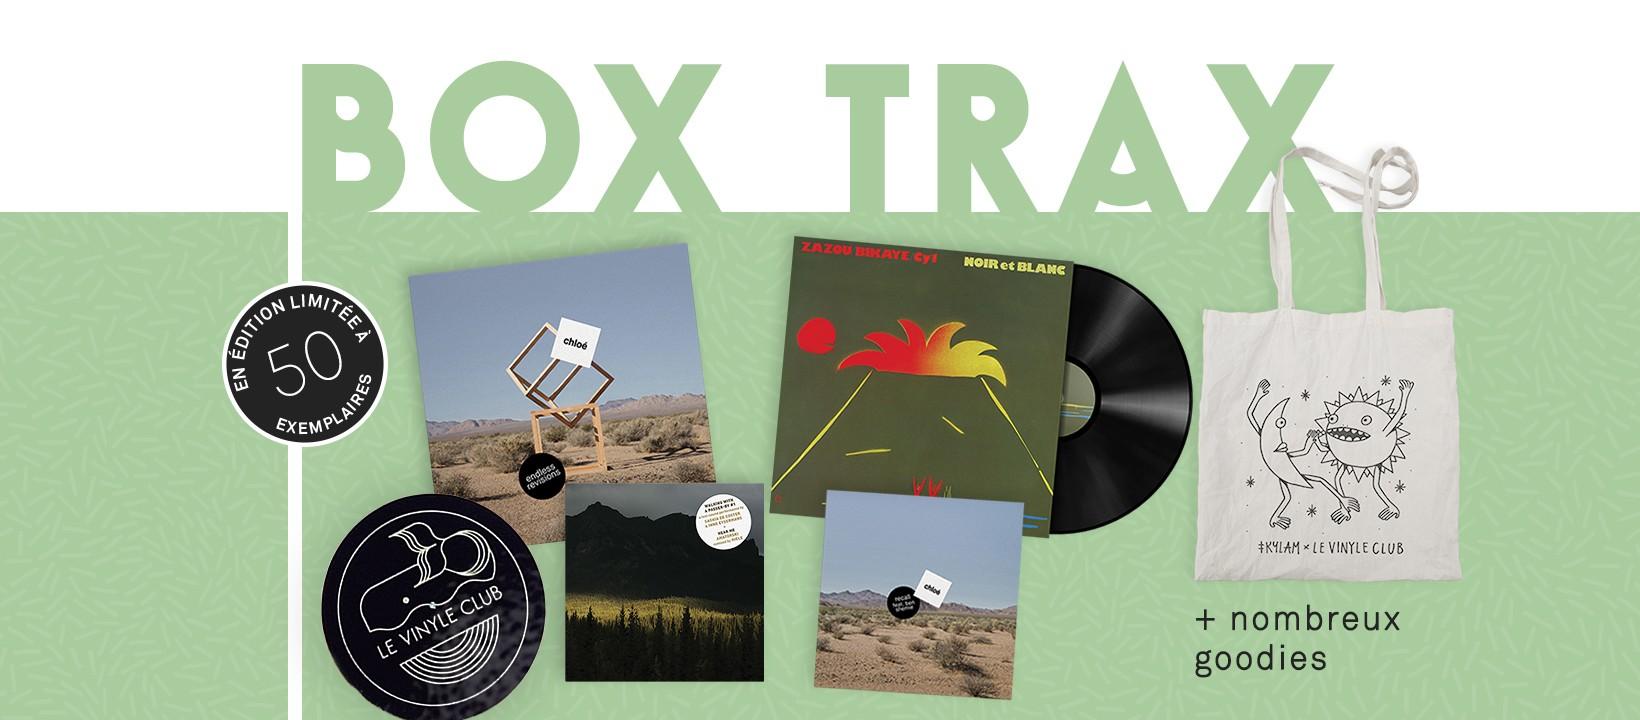 BOX TRAX MAG - Édition Limitée